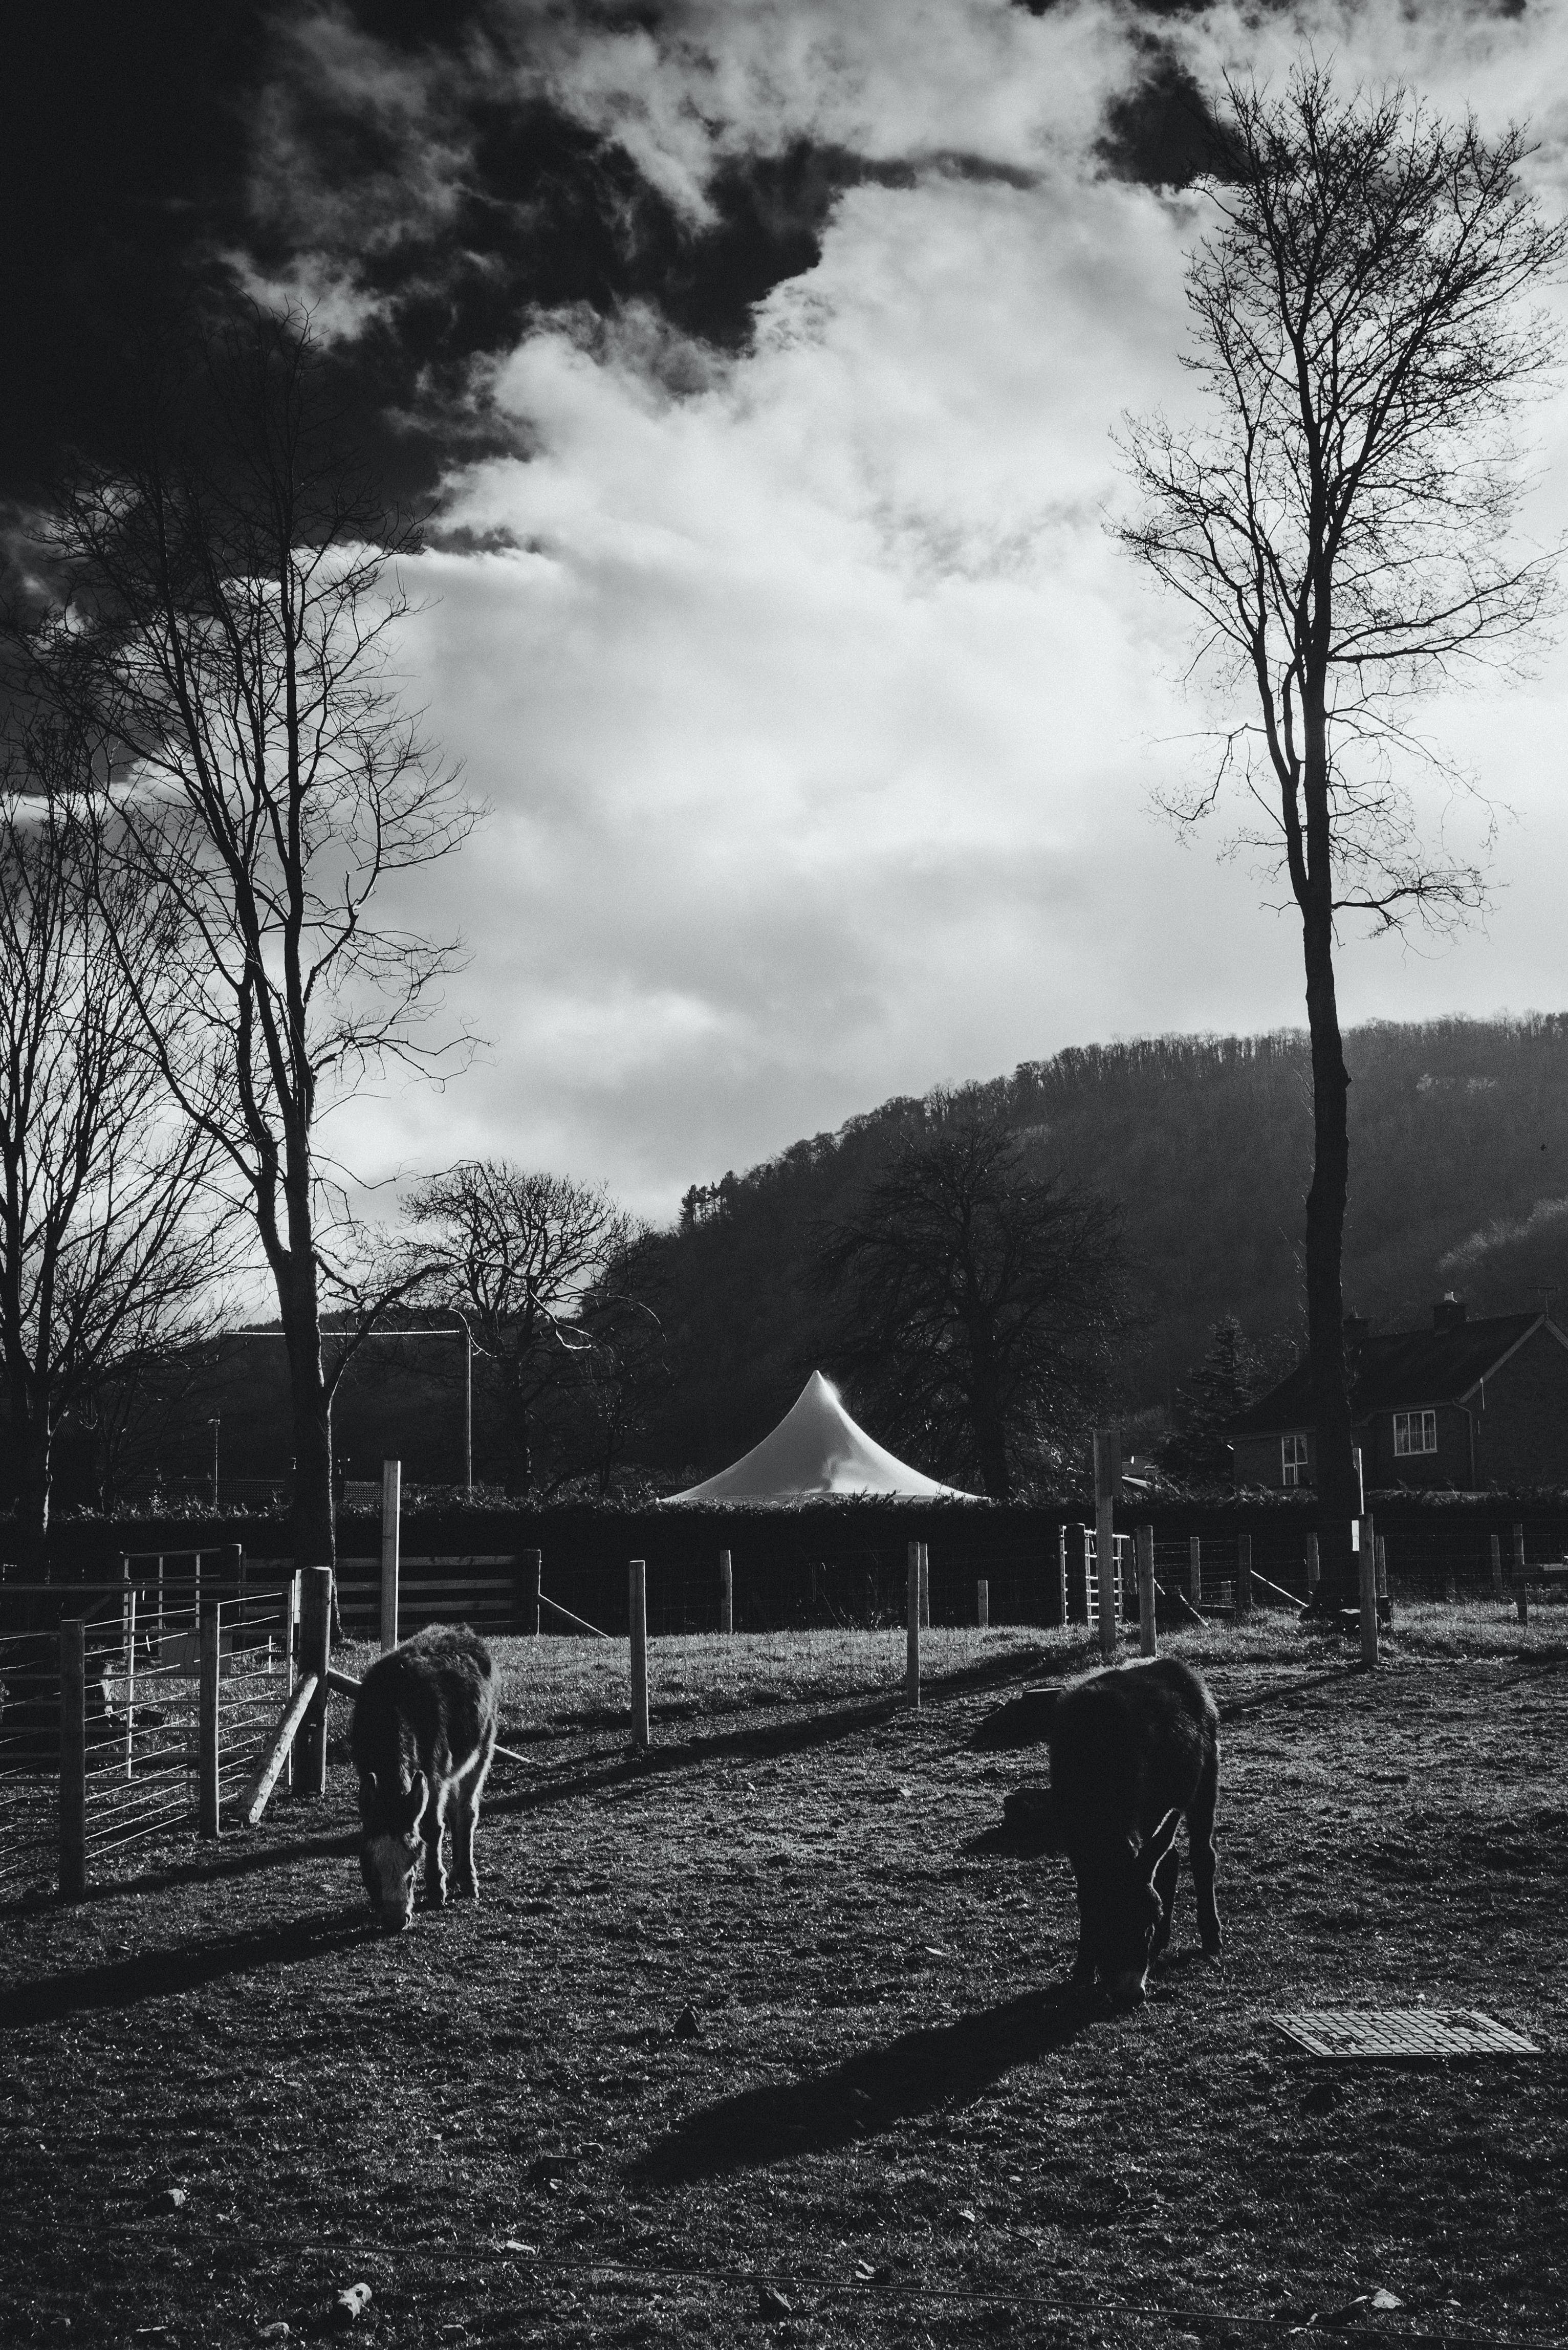 Grayscale Photo of Cattle on Field Near Bare Tree